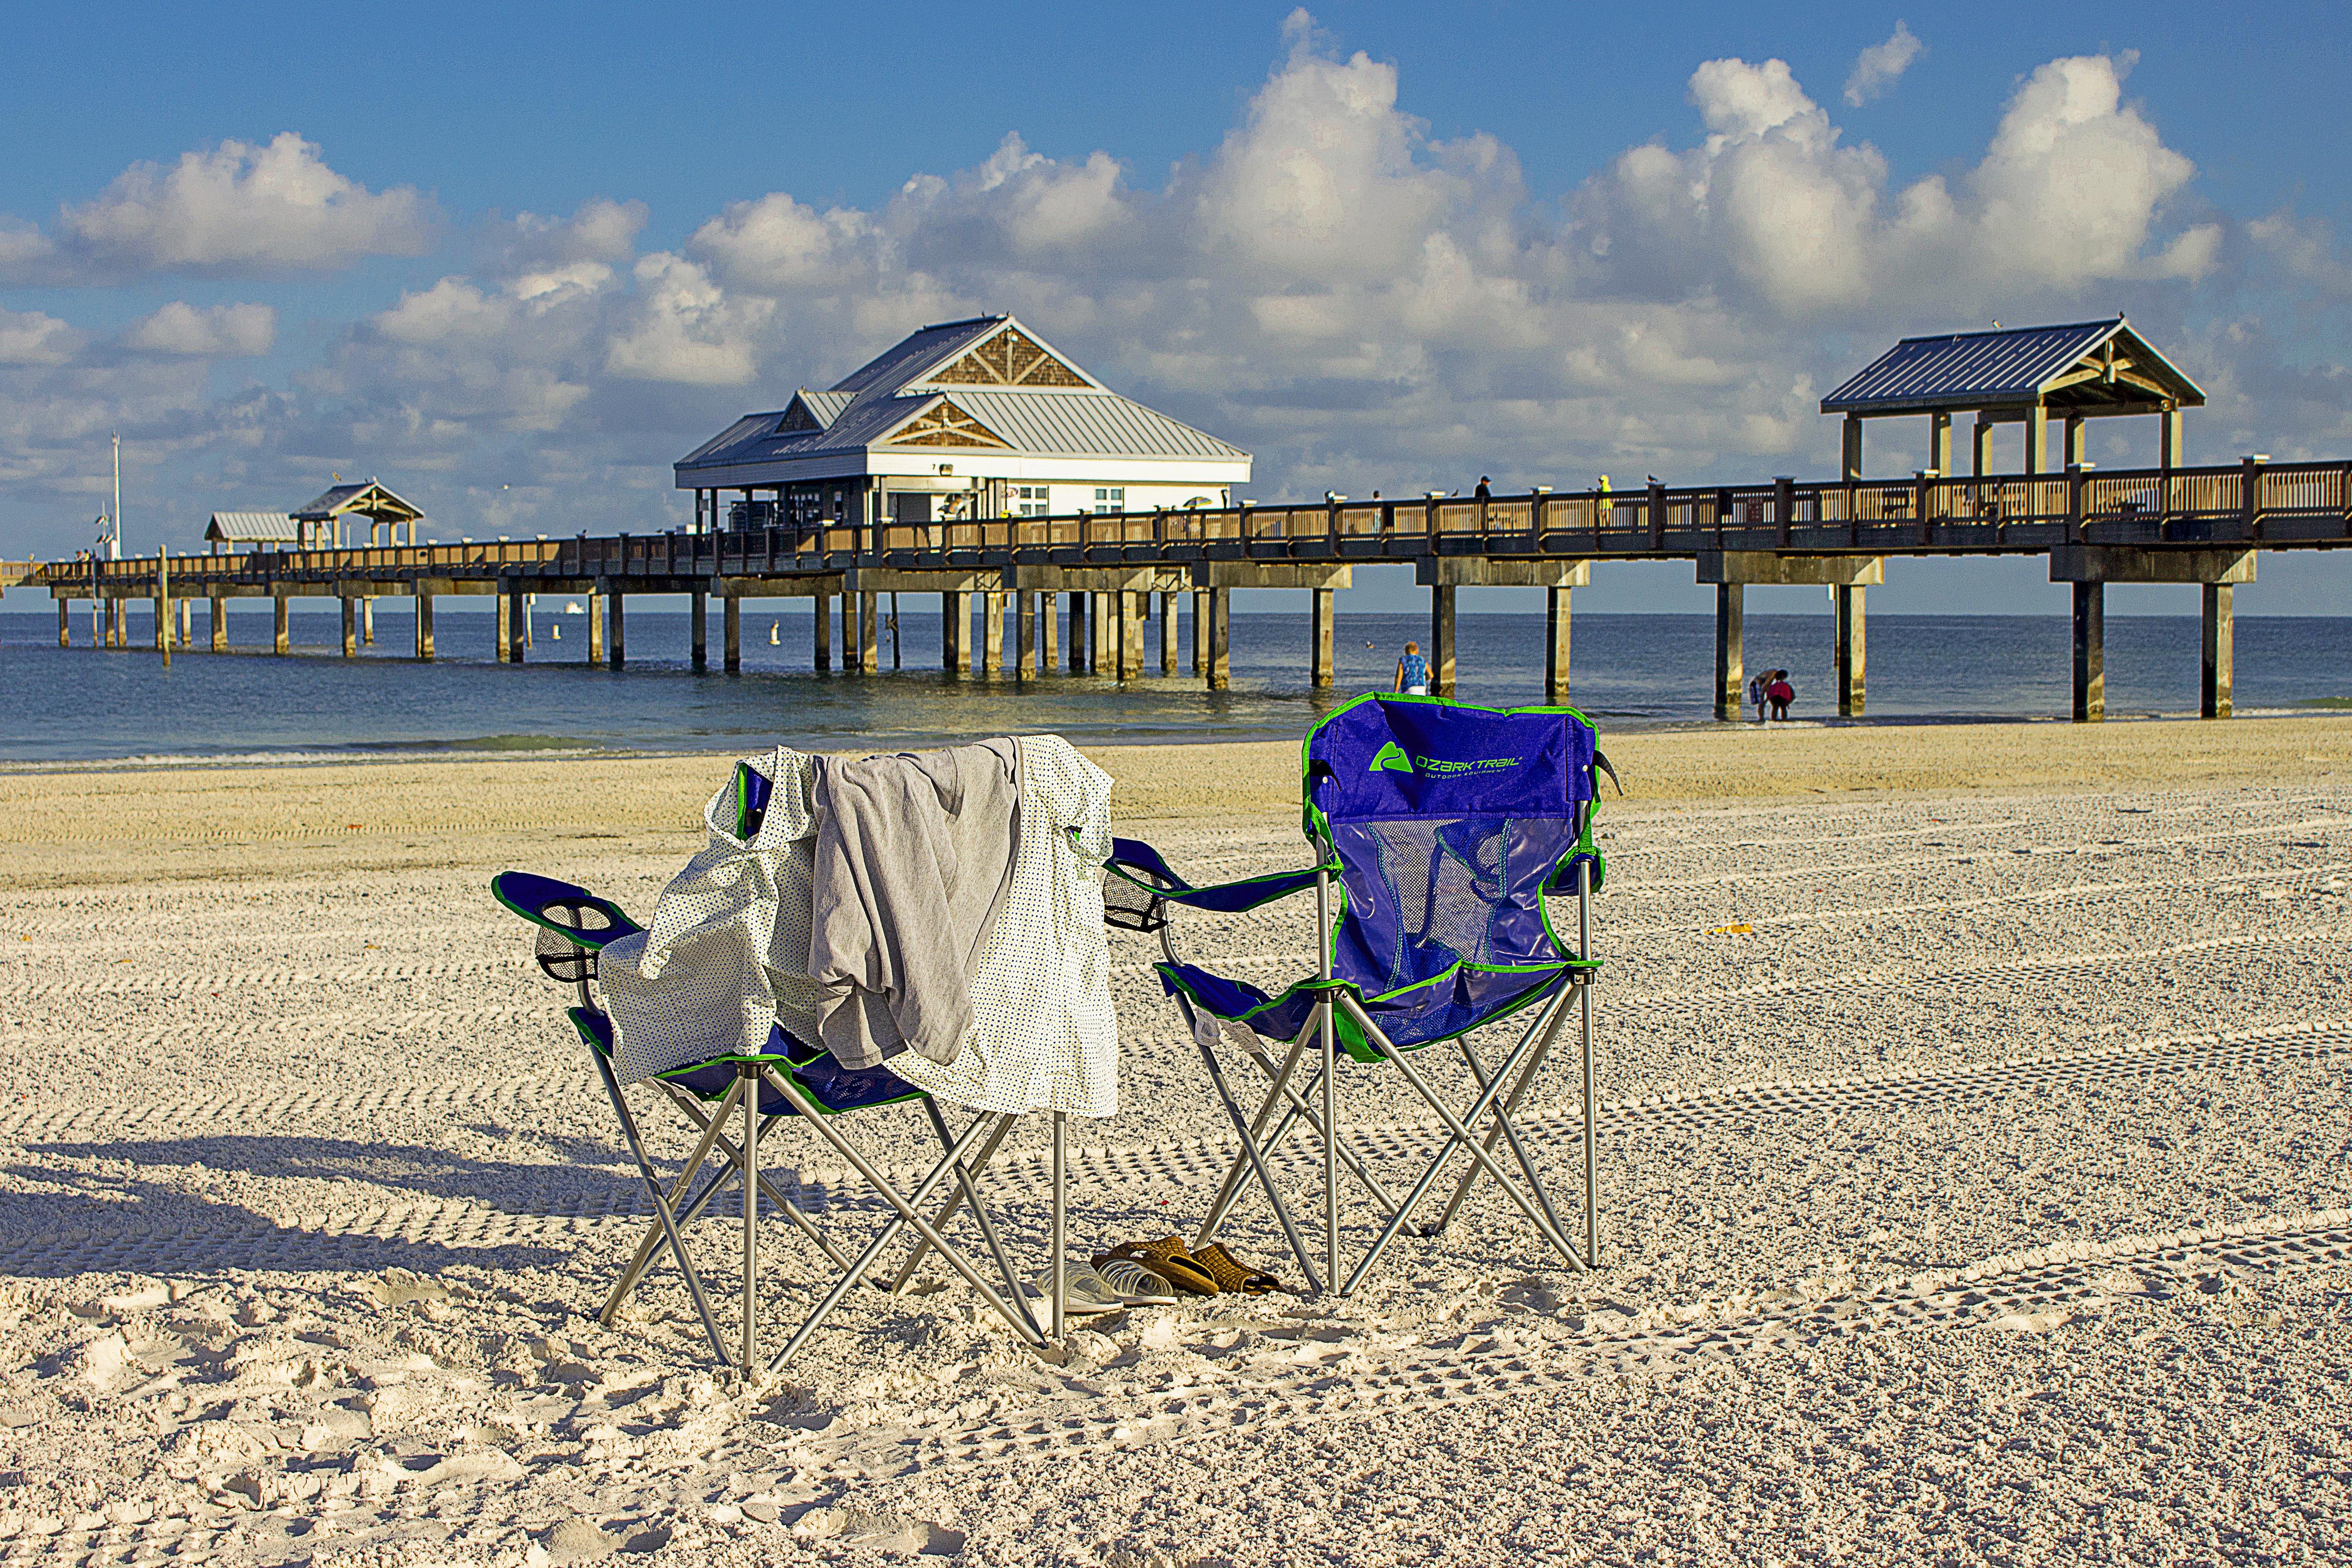 Free Photos Usa Florida Tampa Clearwater Beach